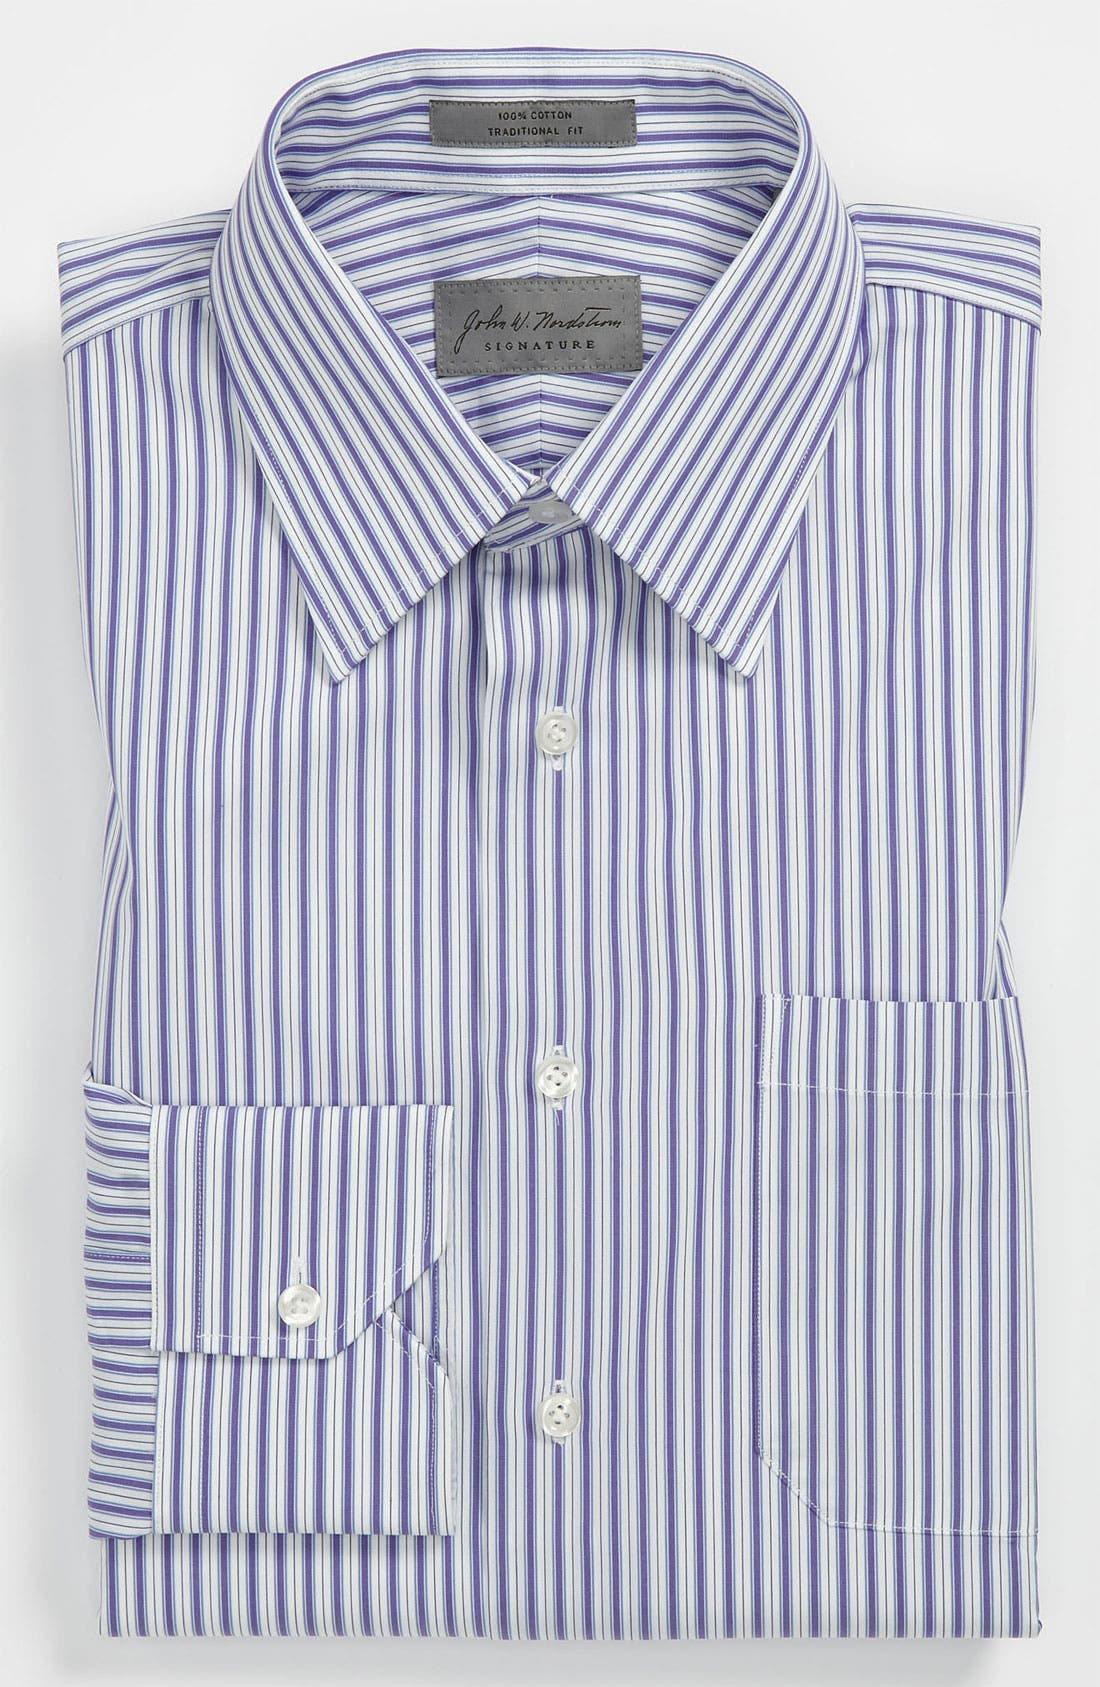 Alternate Image 1 Selected - John W. Nordstrom Traditional Fit Dress Shirt